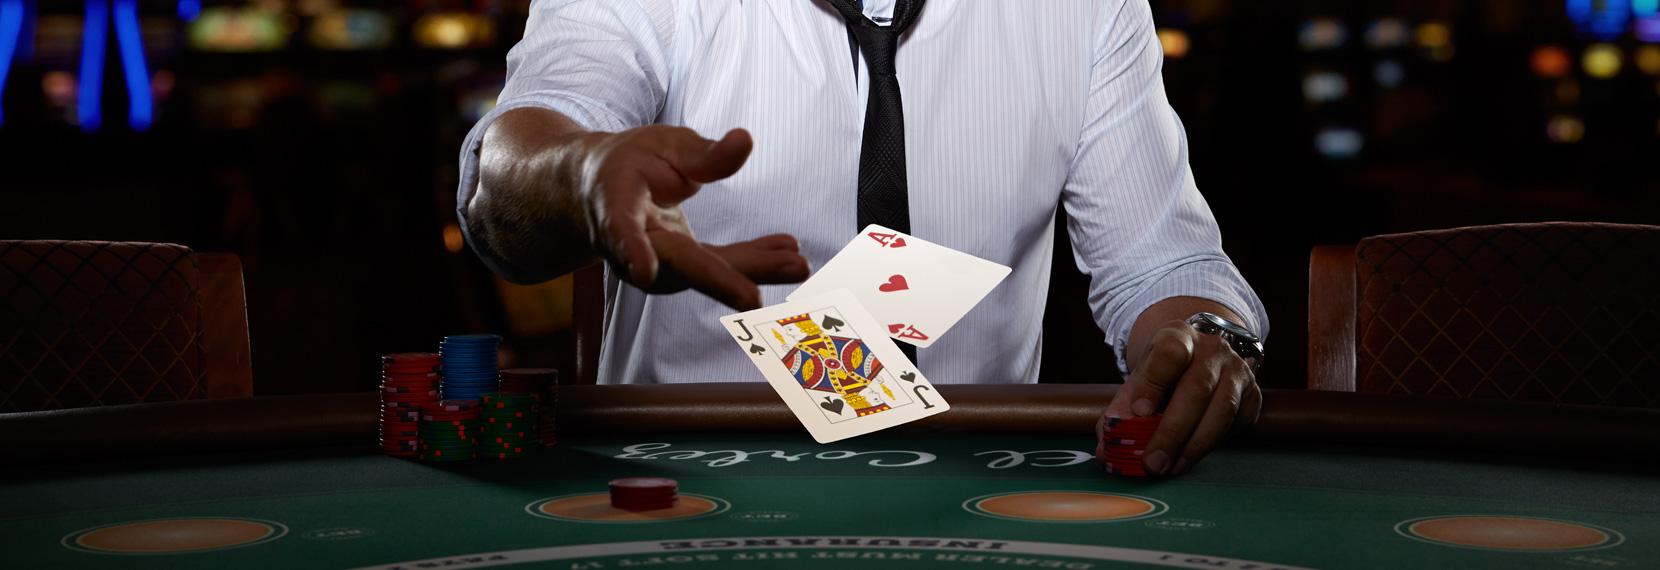 Blackjack holland casino strategie